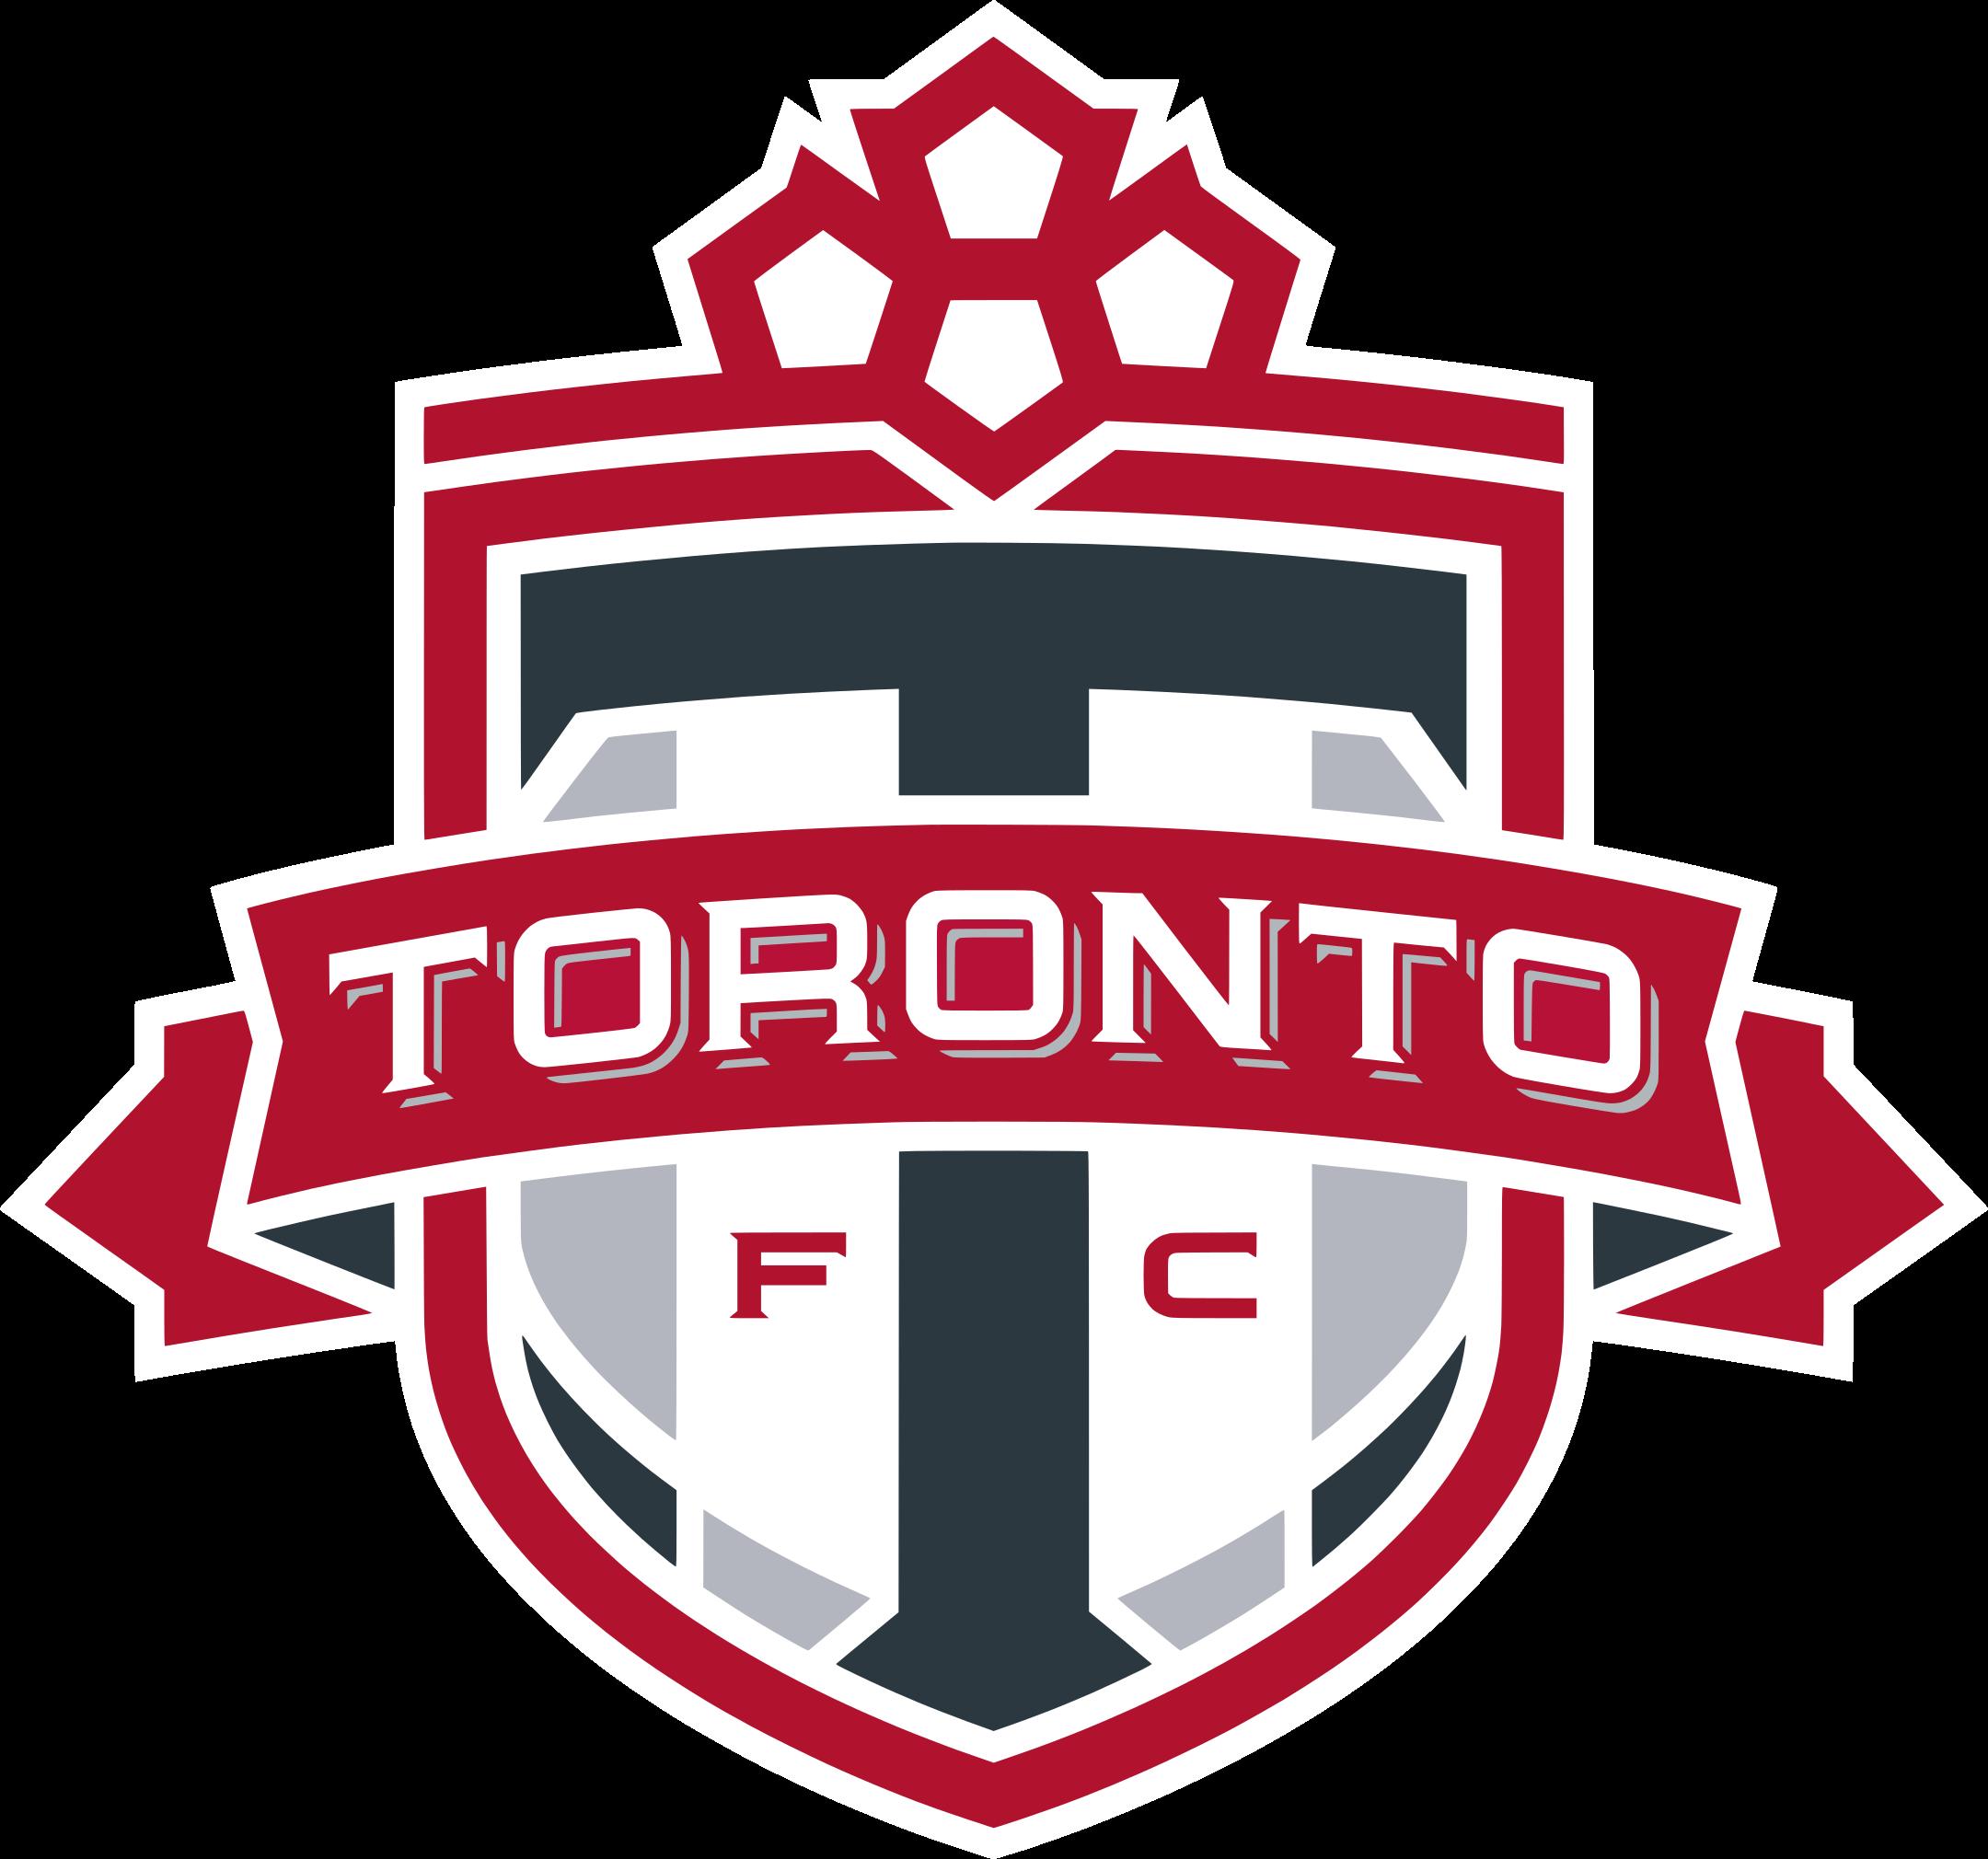 toronto fc logo 1 - Toronto FC Logo